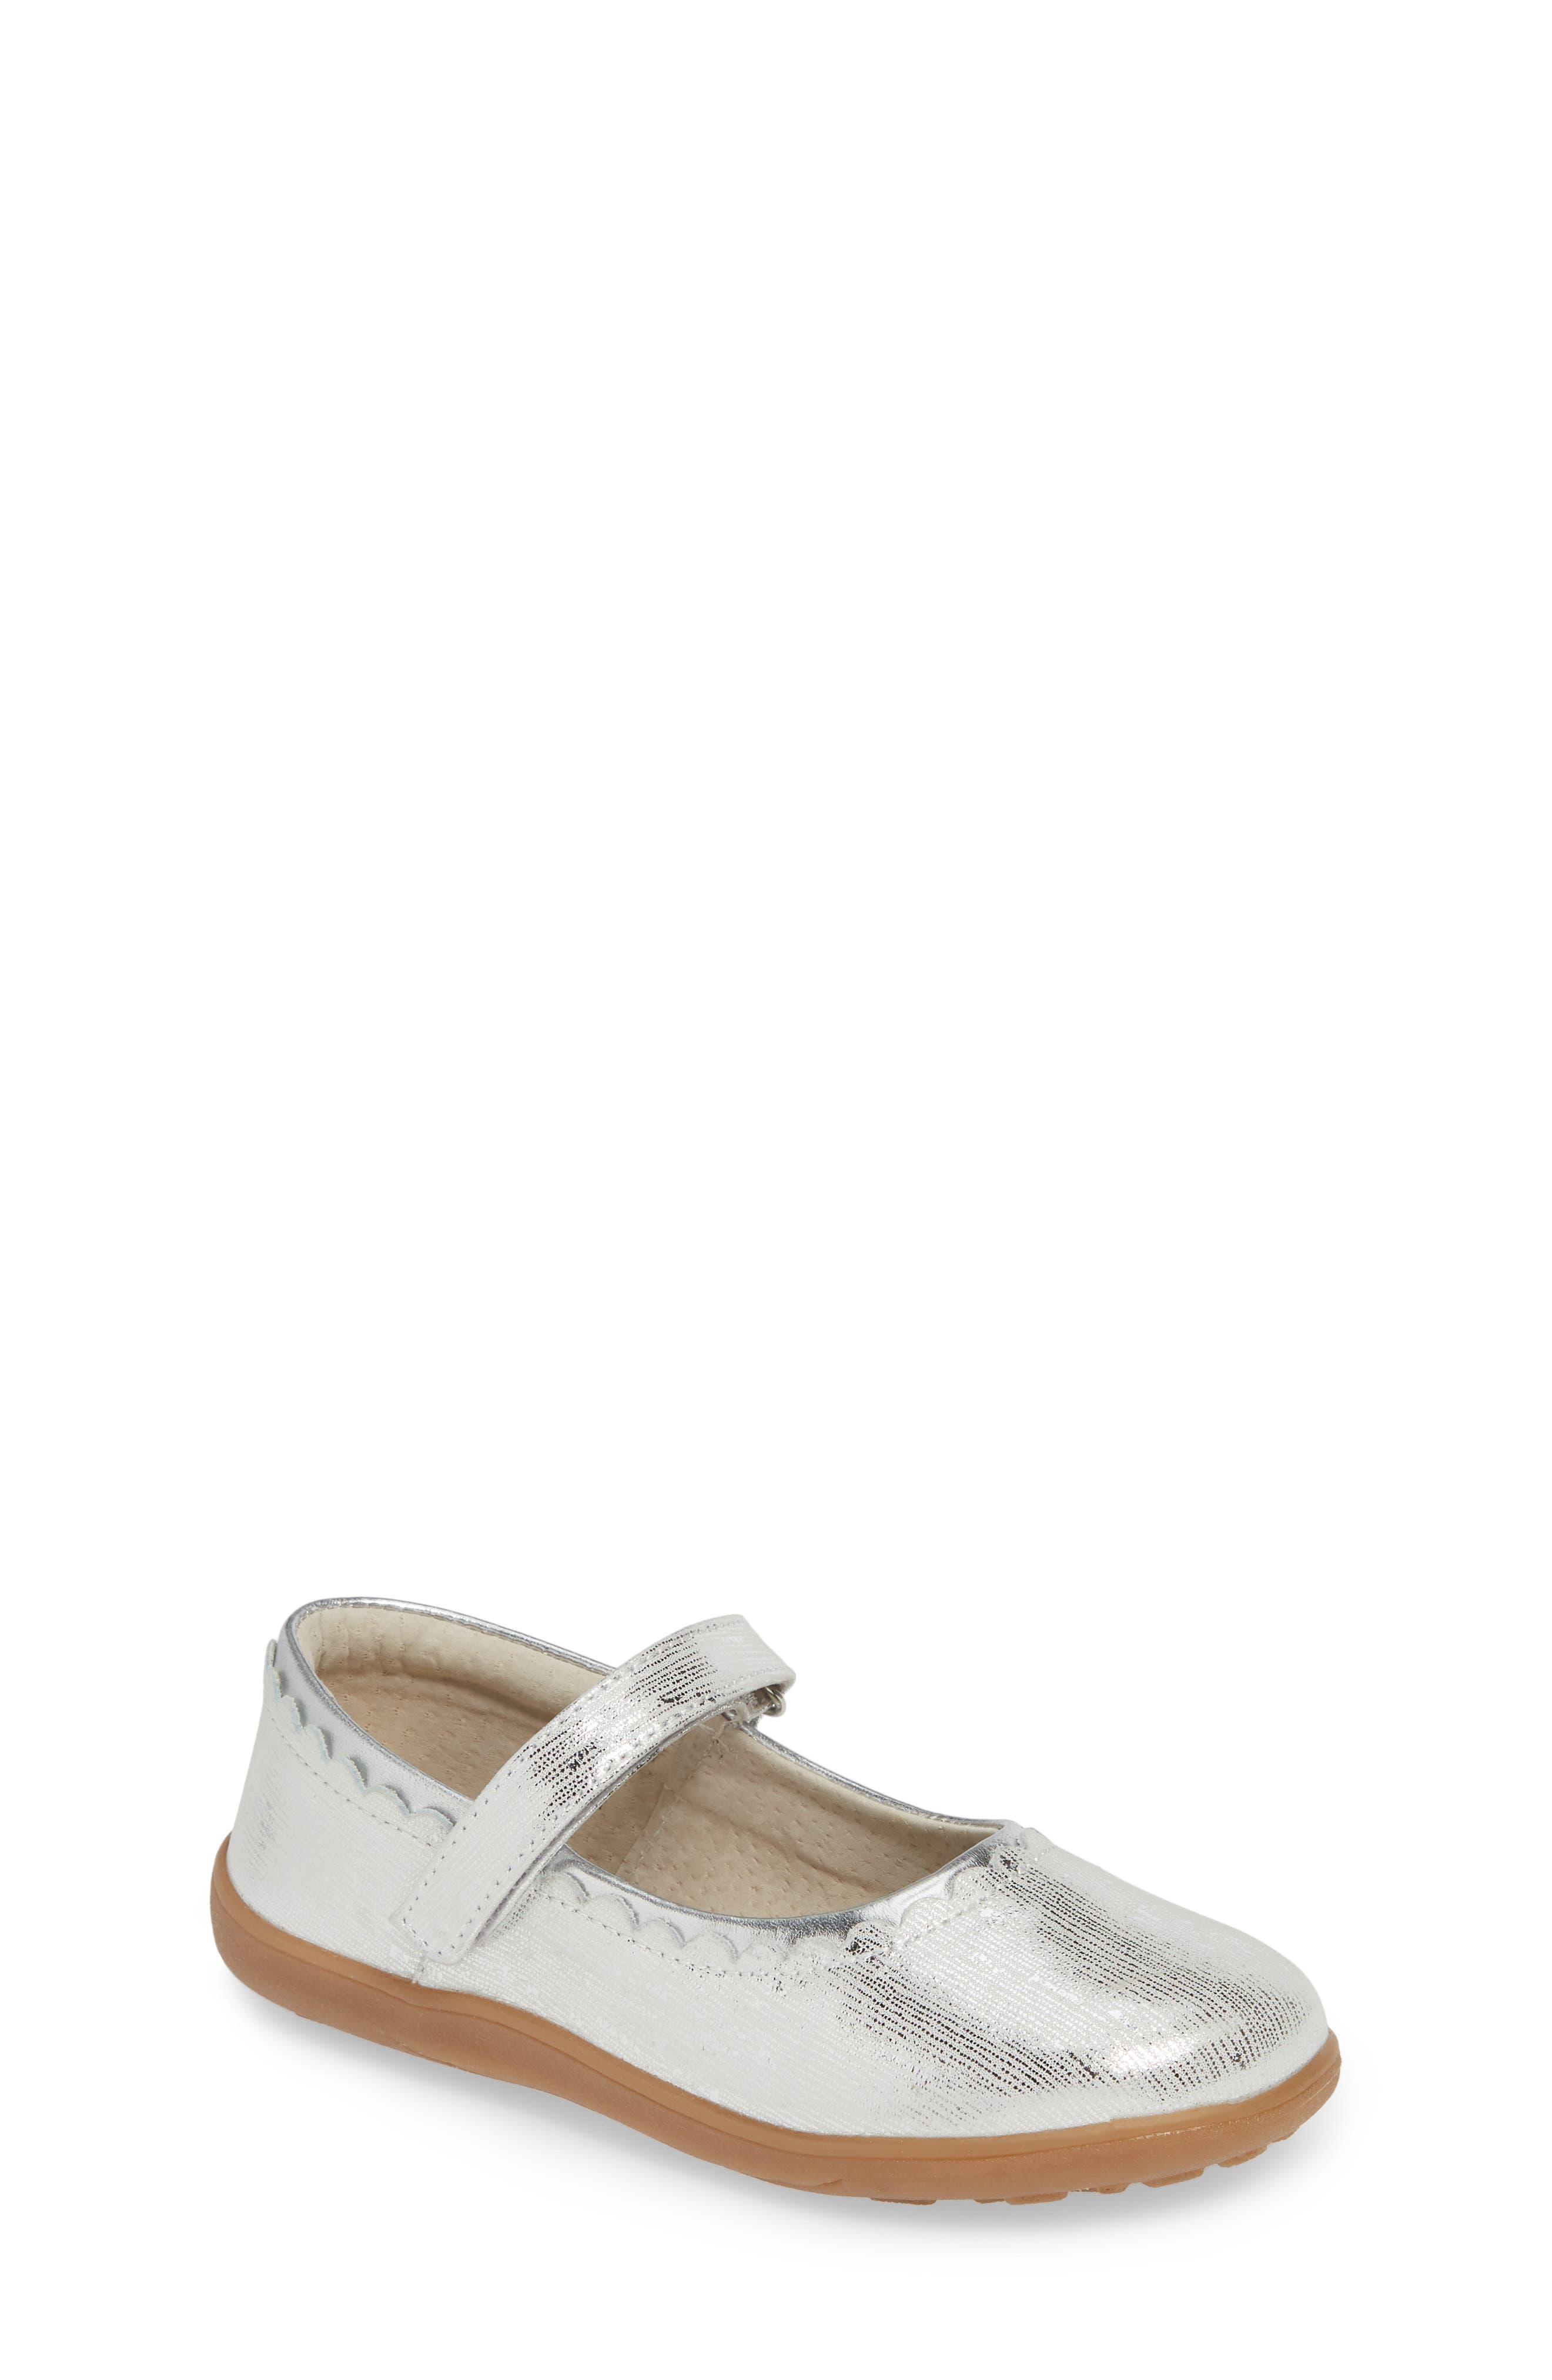 c20f46cb1daf Girls  Mary Jane Shoes